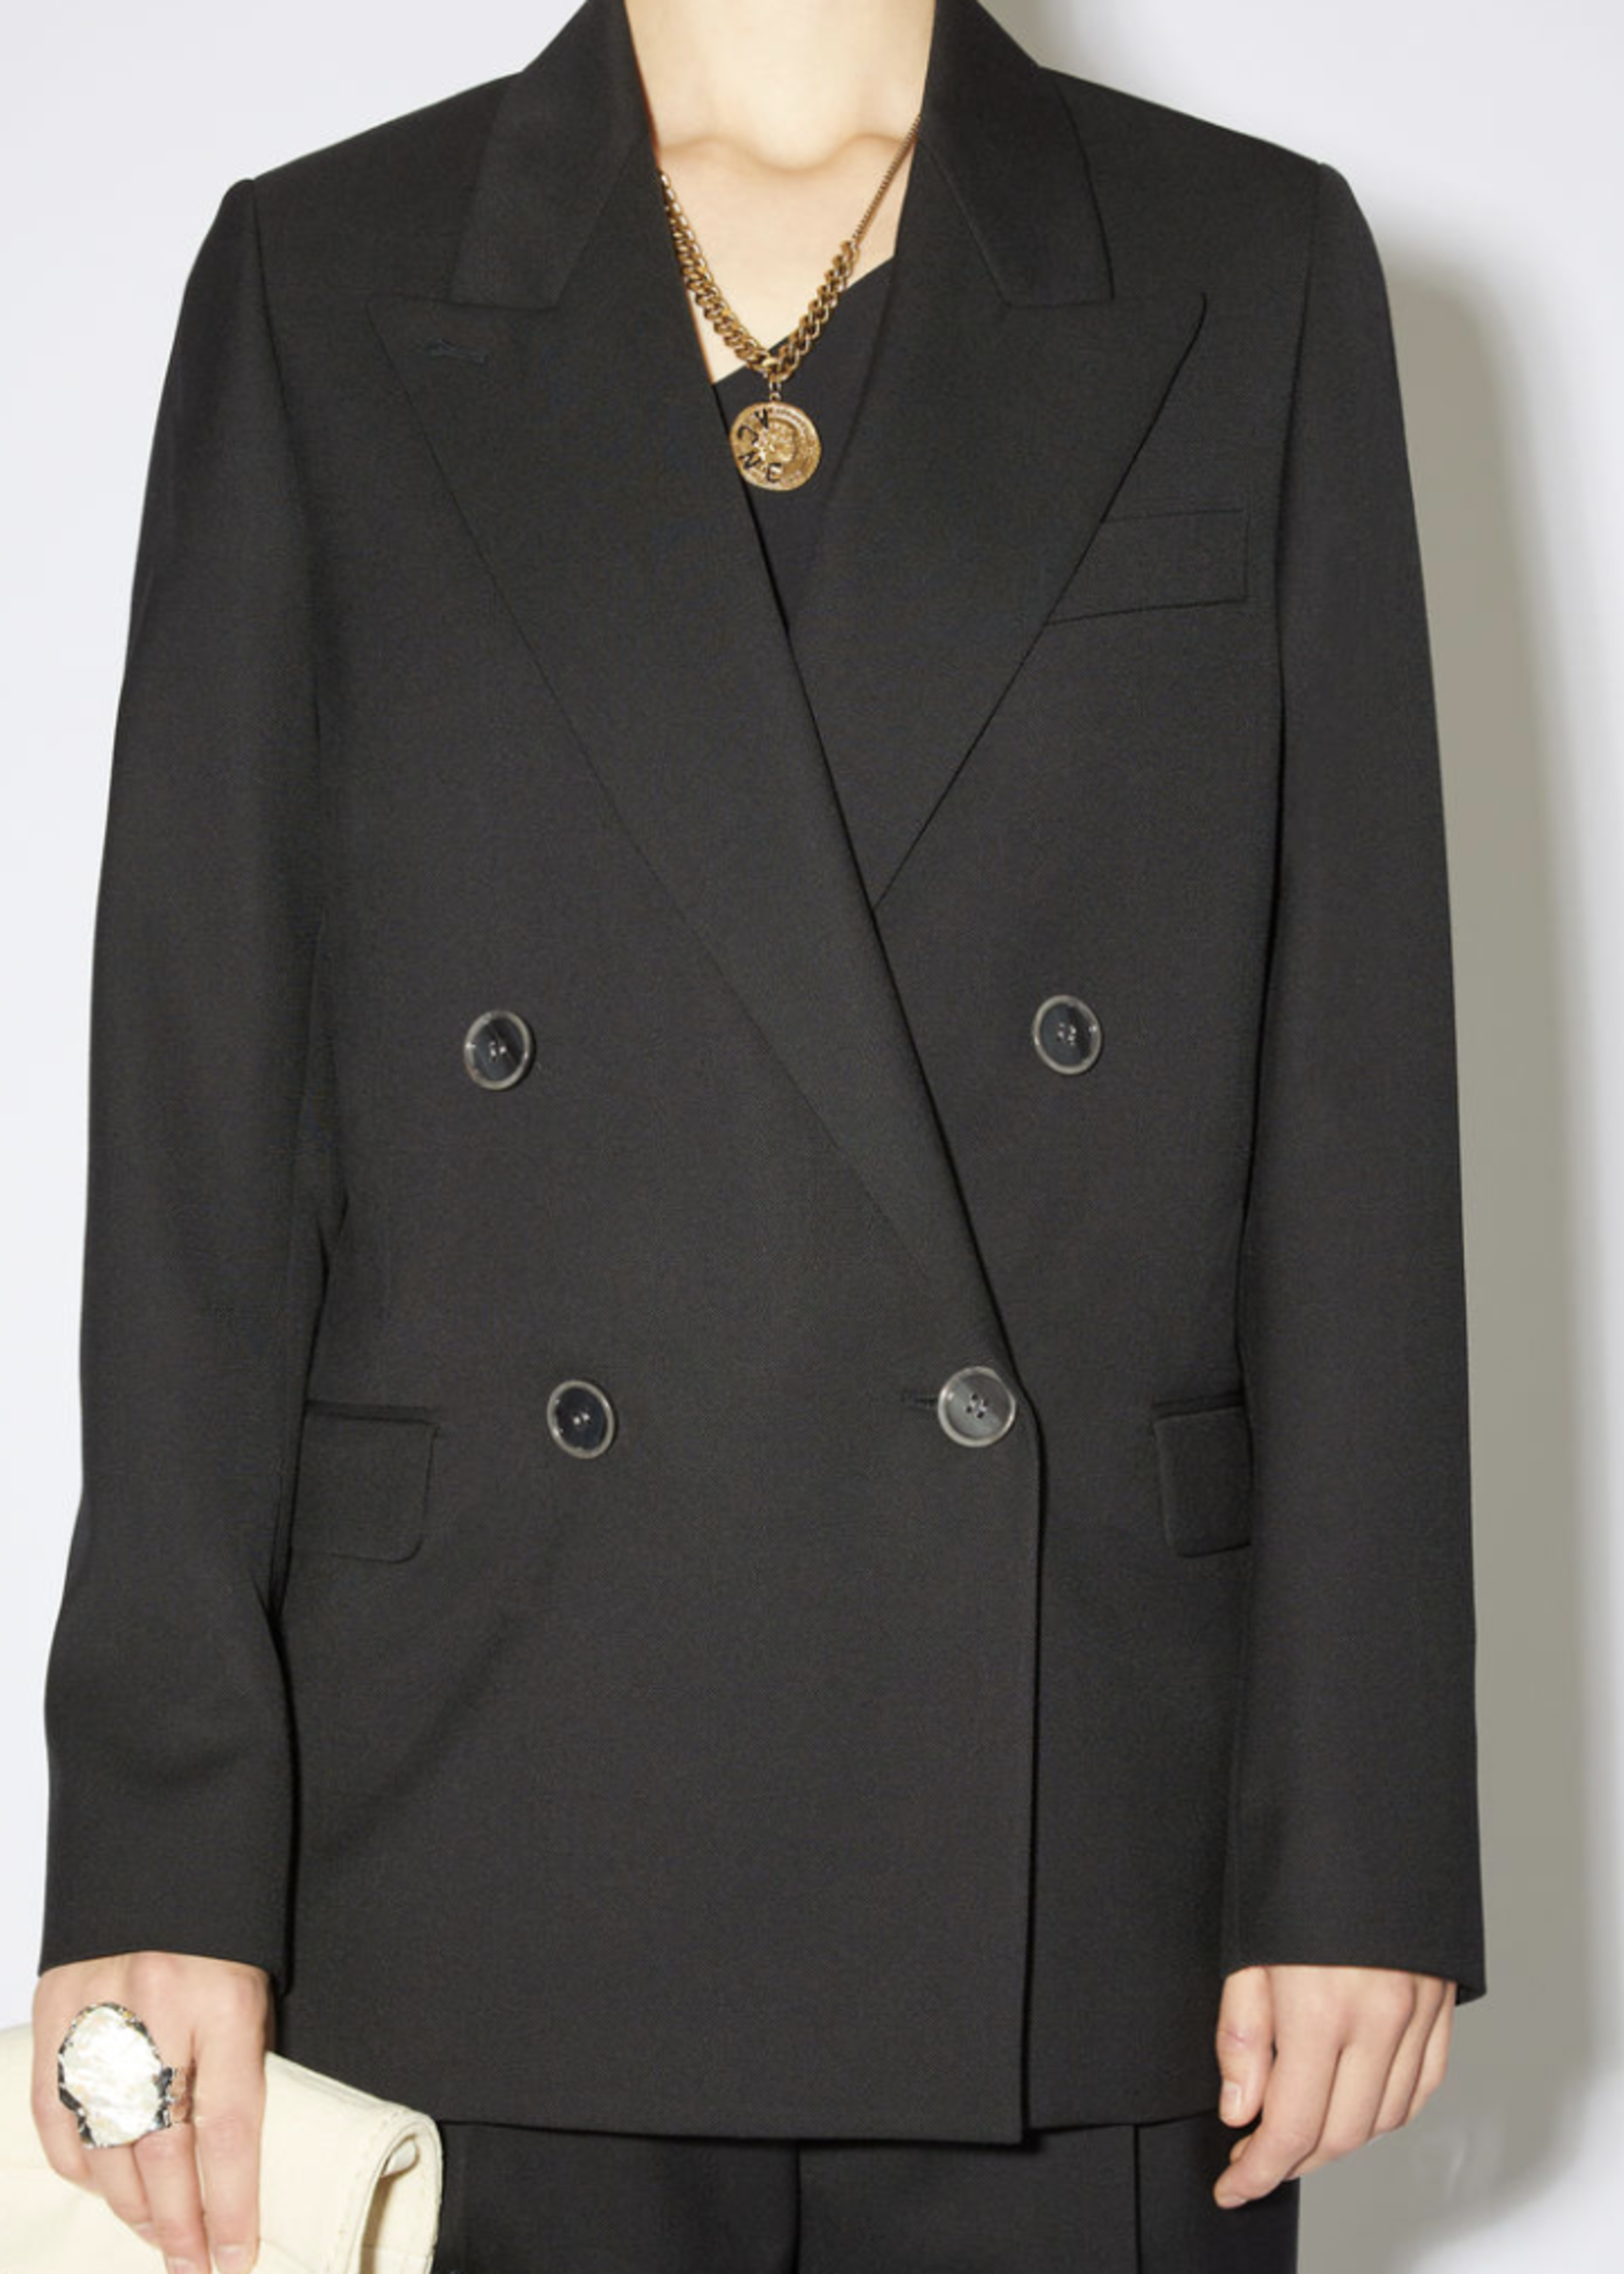 Acne Studios Acnestudios janny light summerwool blazer black36